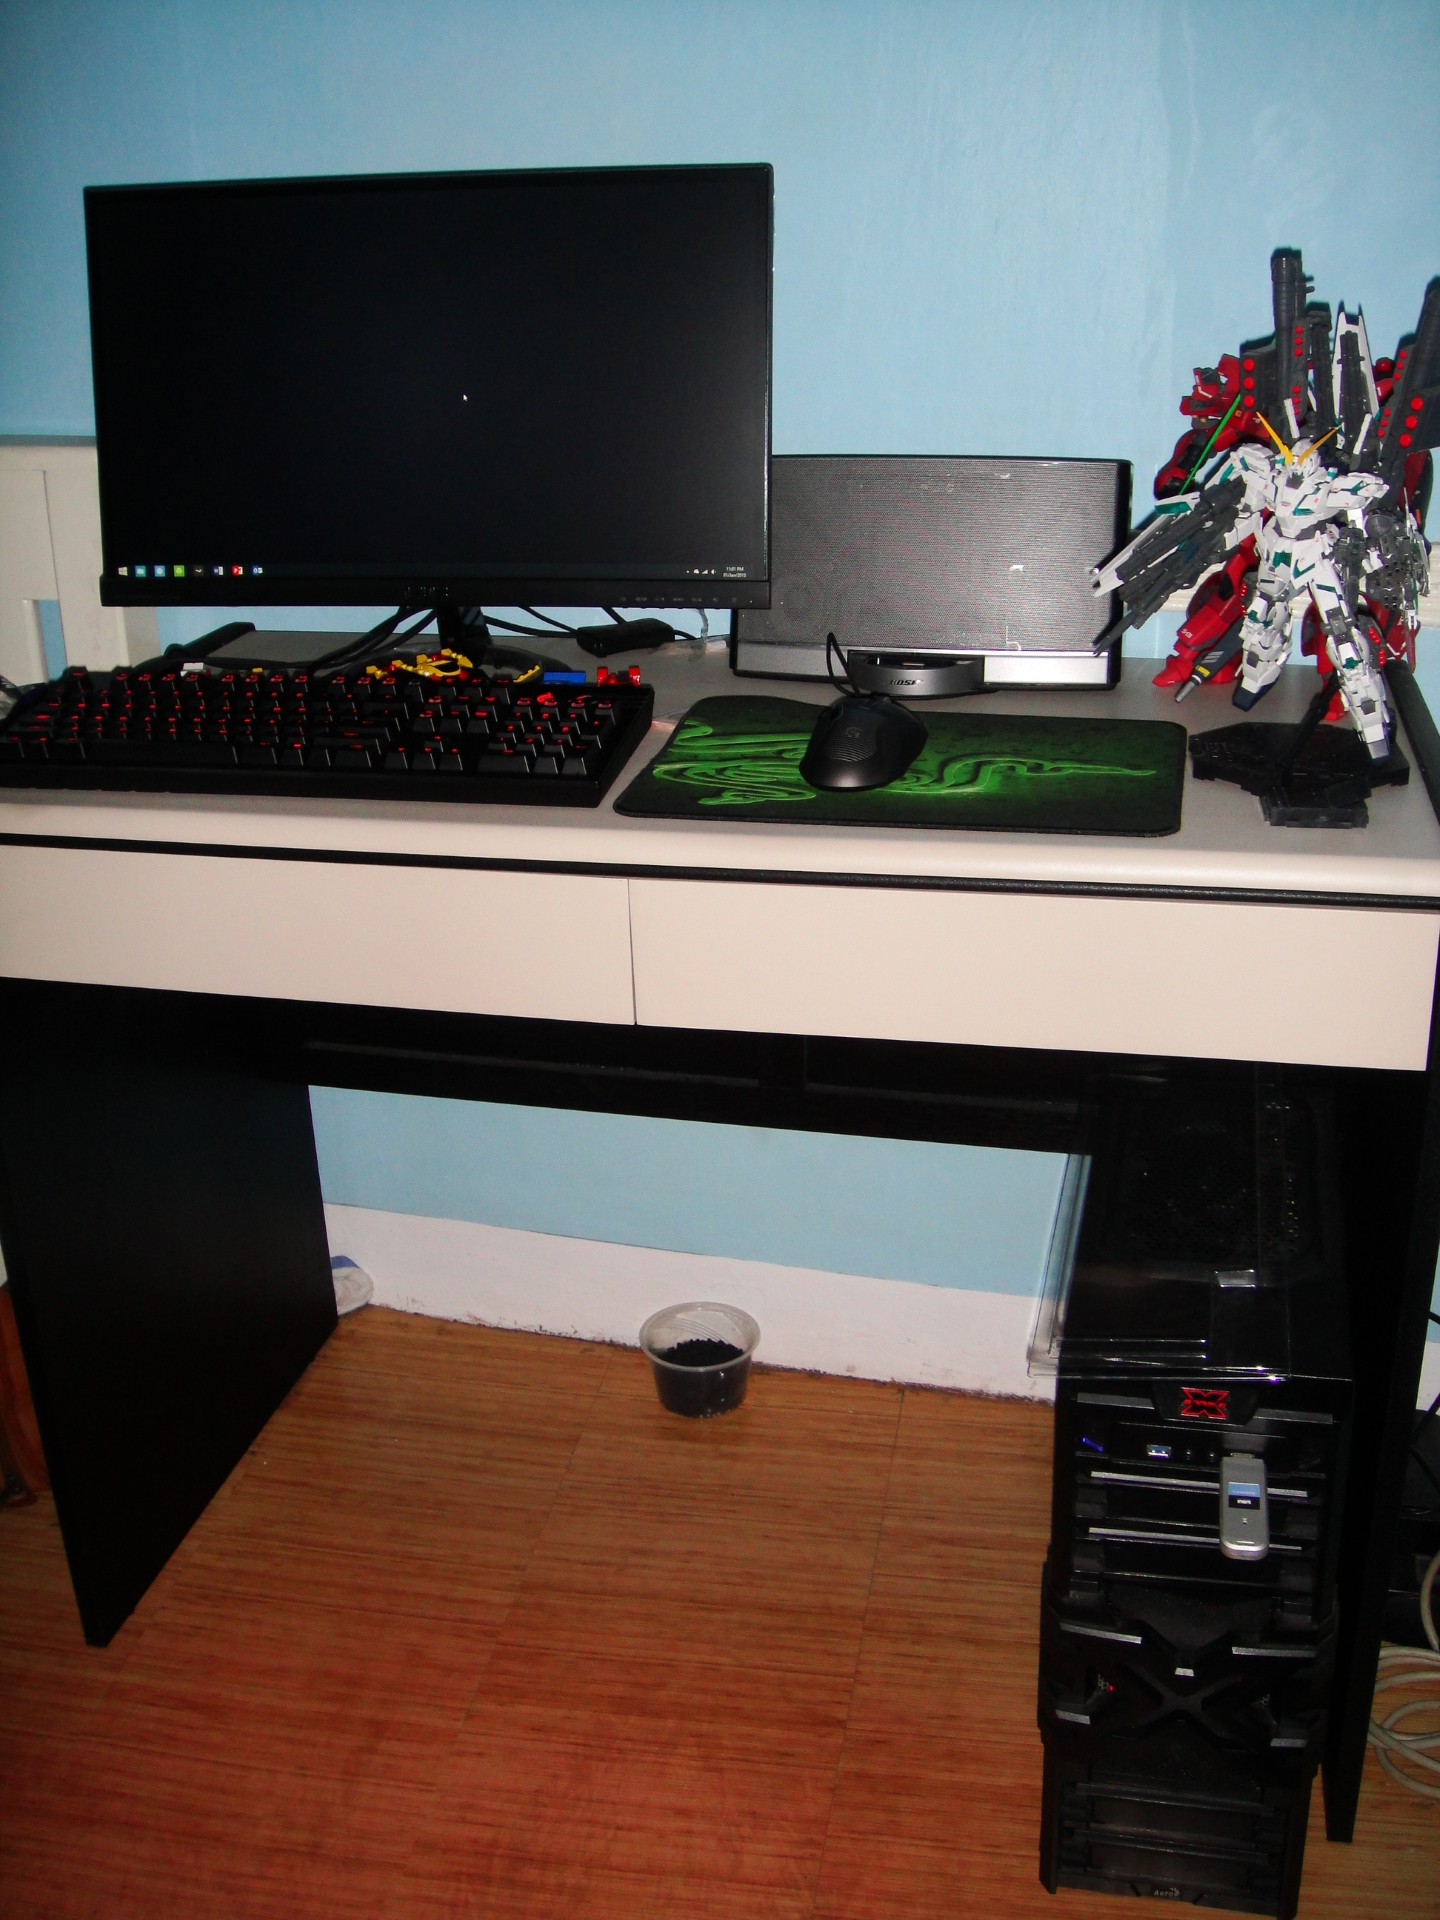 WorkstationSmall.jpg